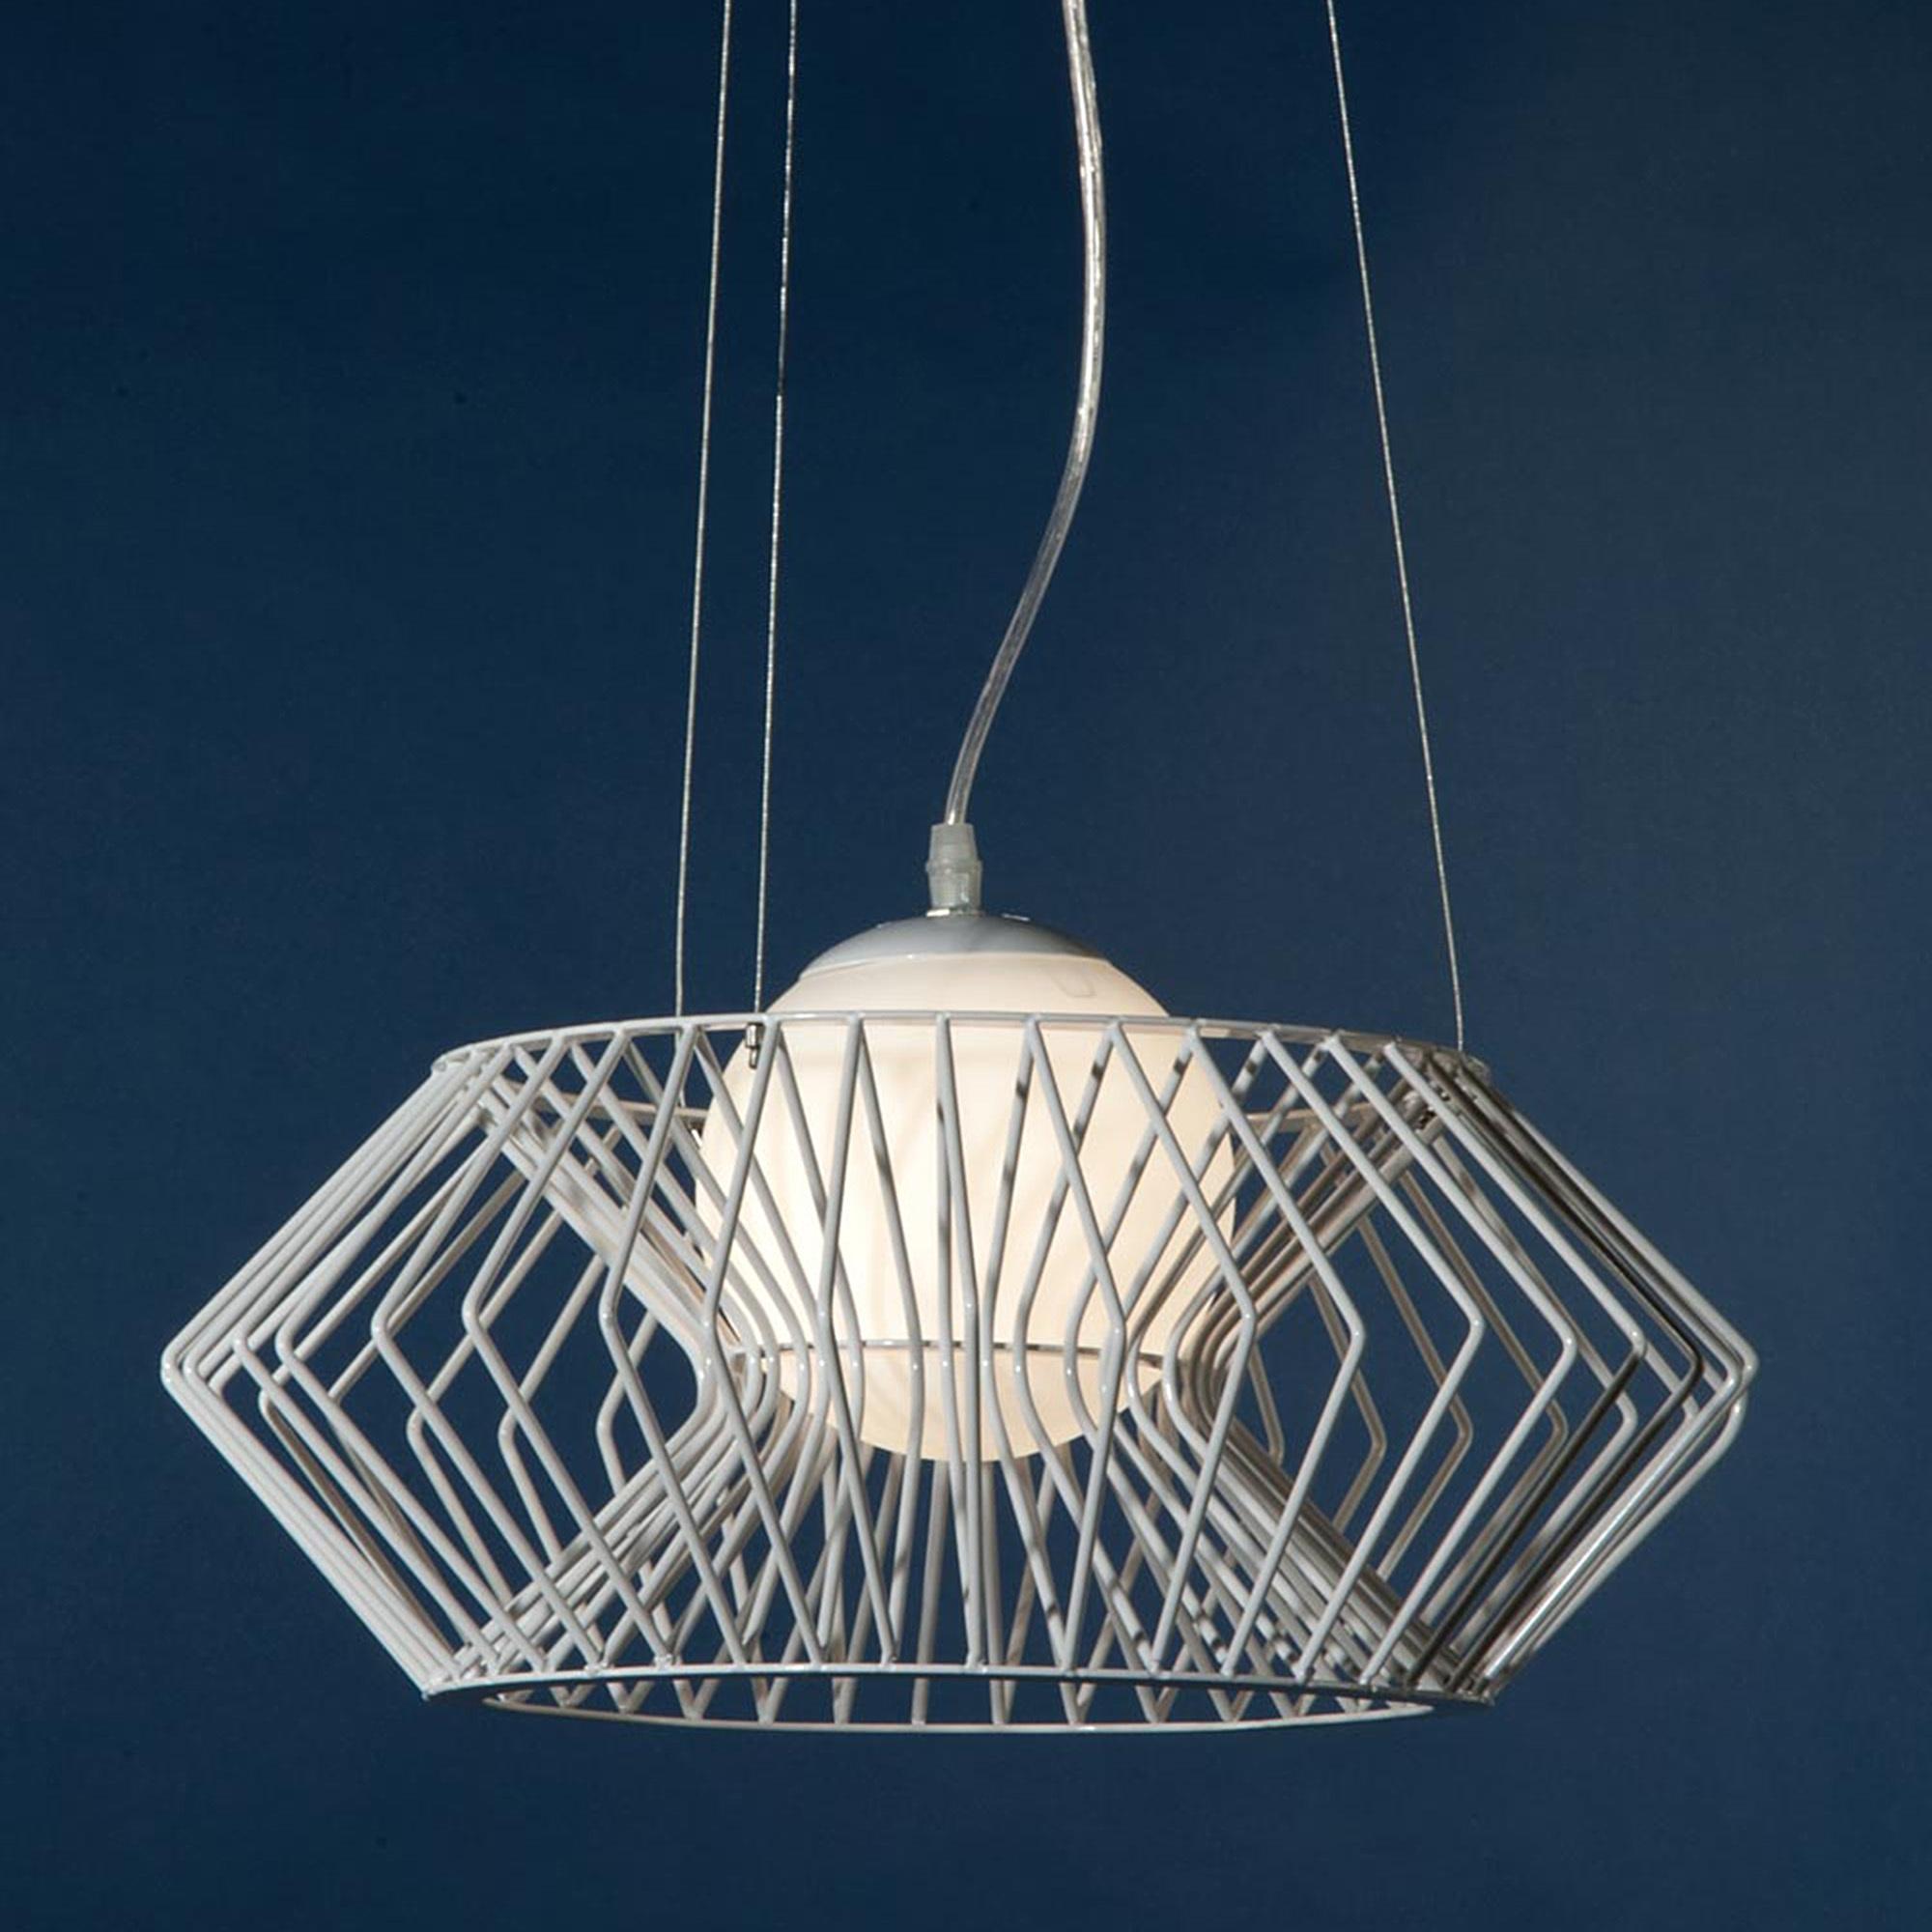 Geometric Pendant Ceiling Light - White